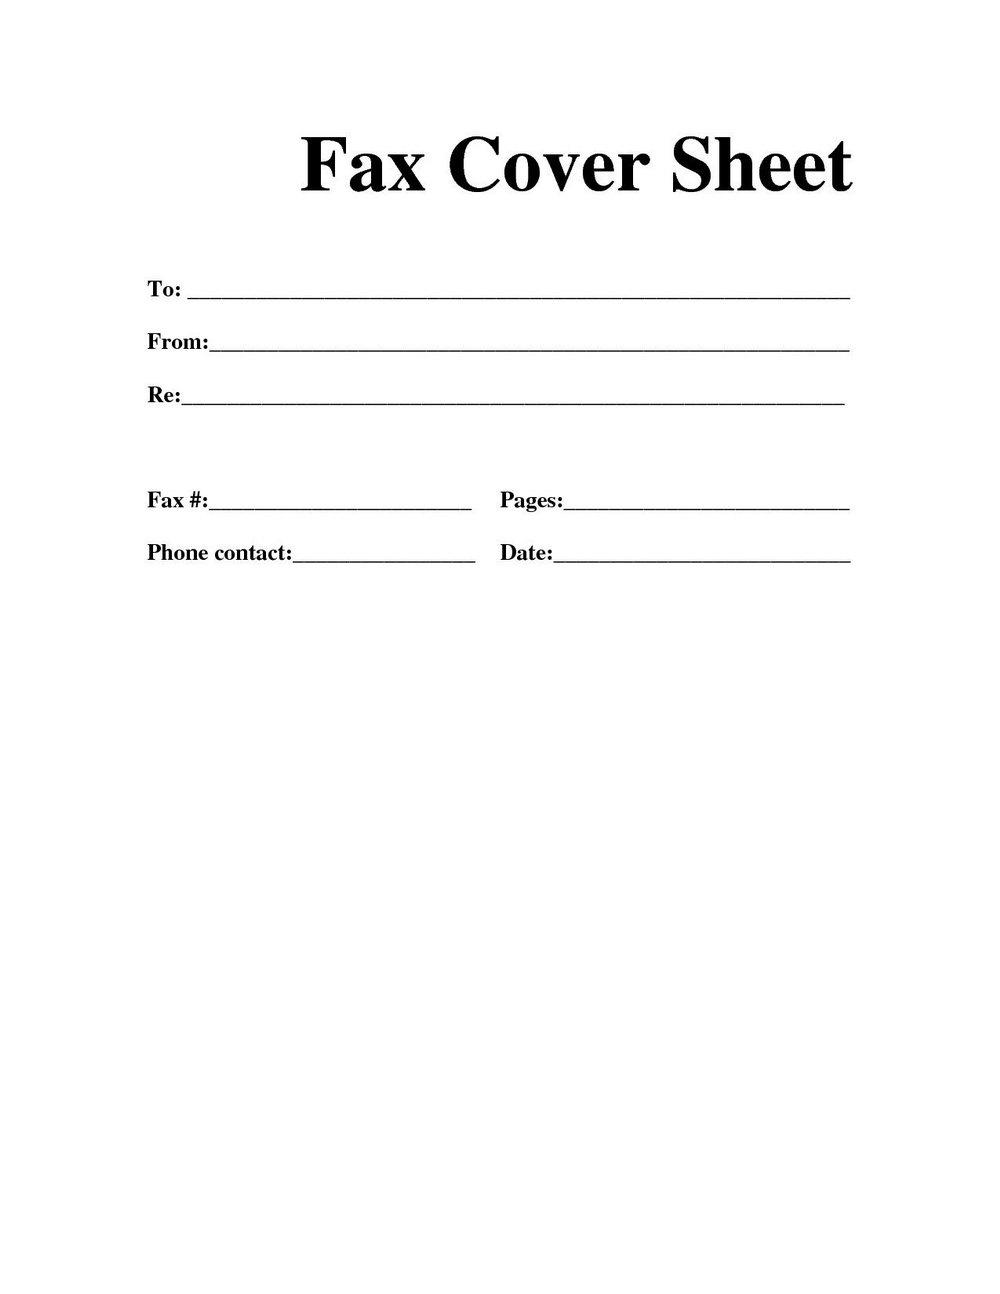 Blank Fax Cover Sheet Template Mbm Legal